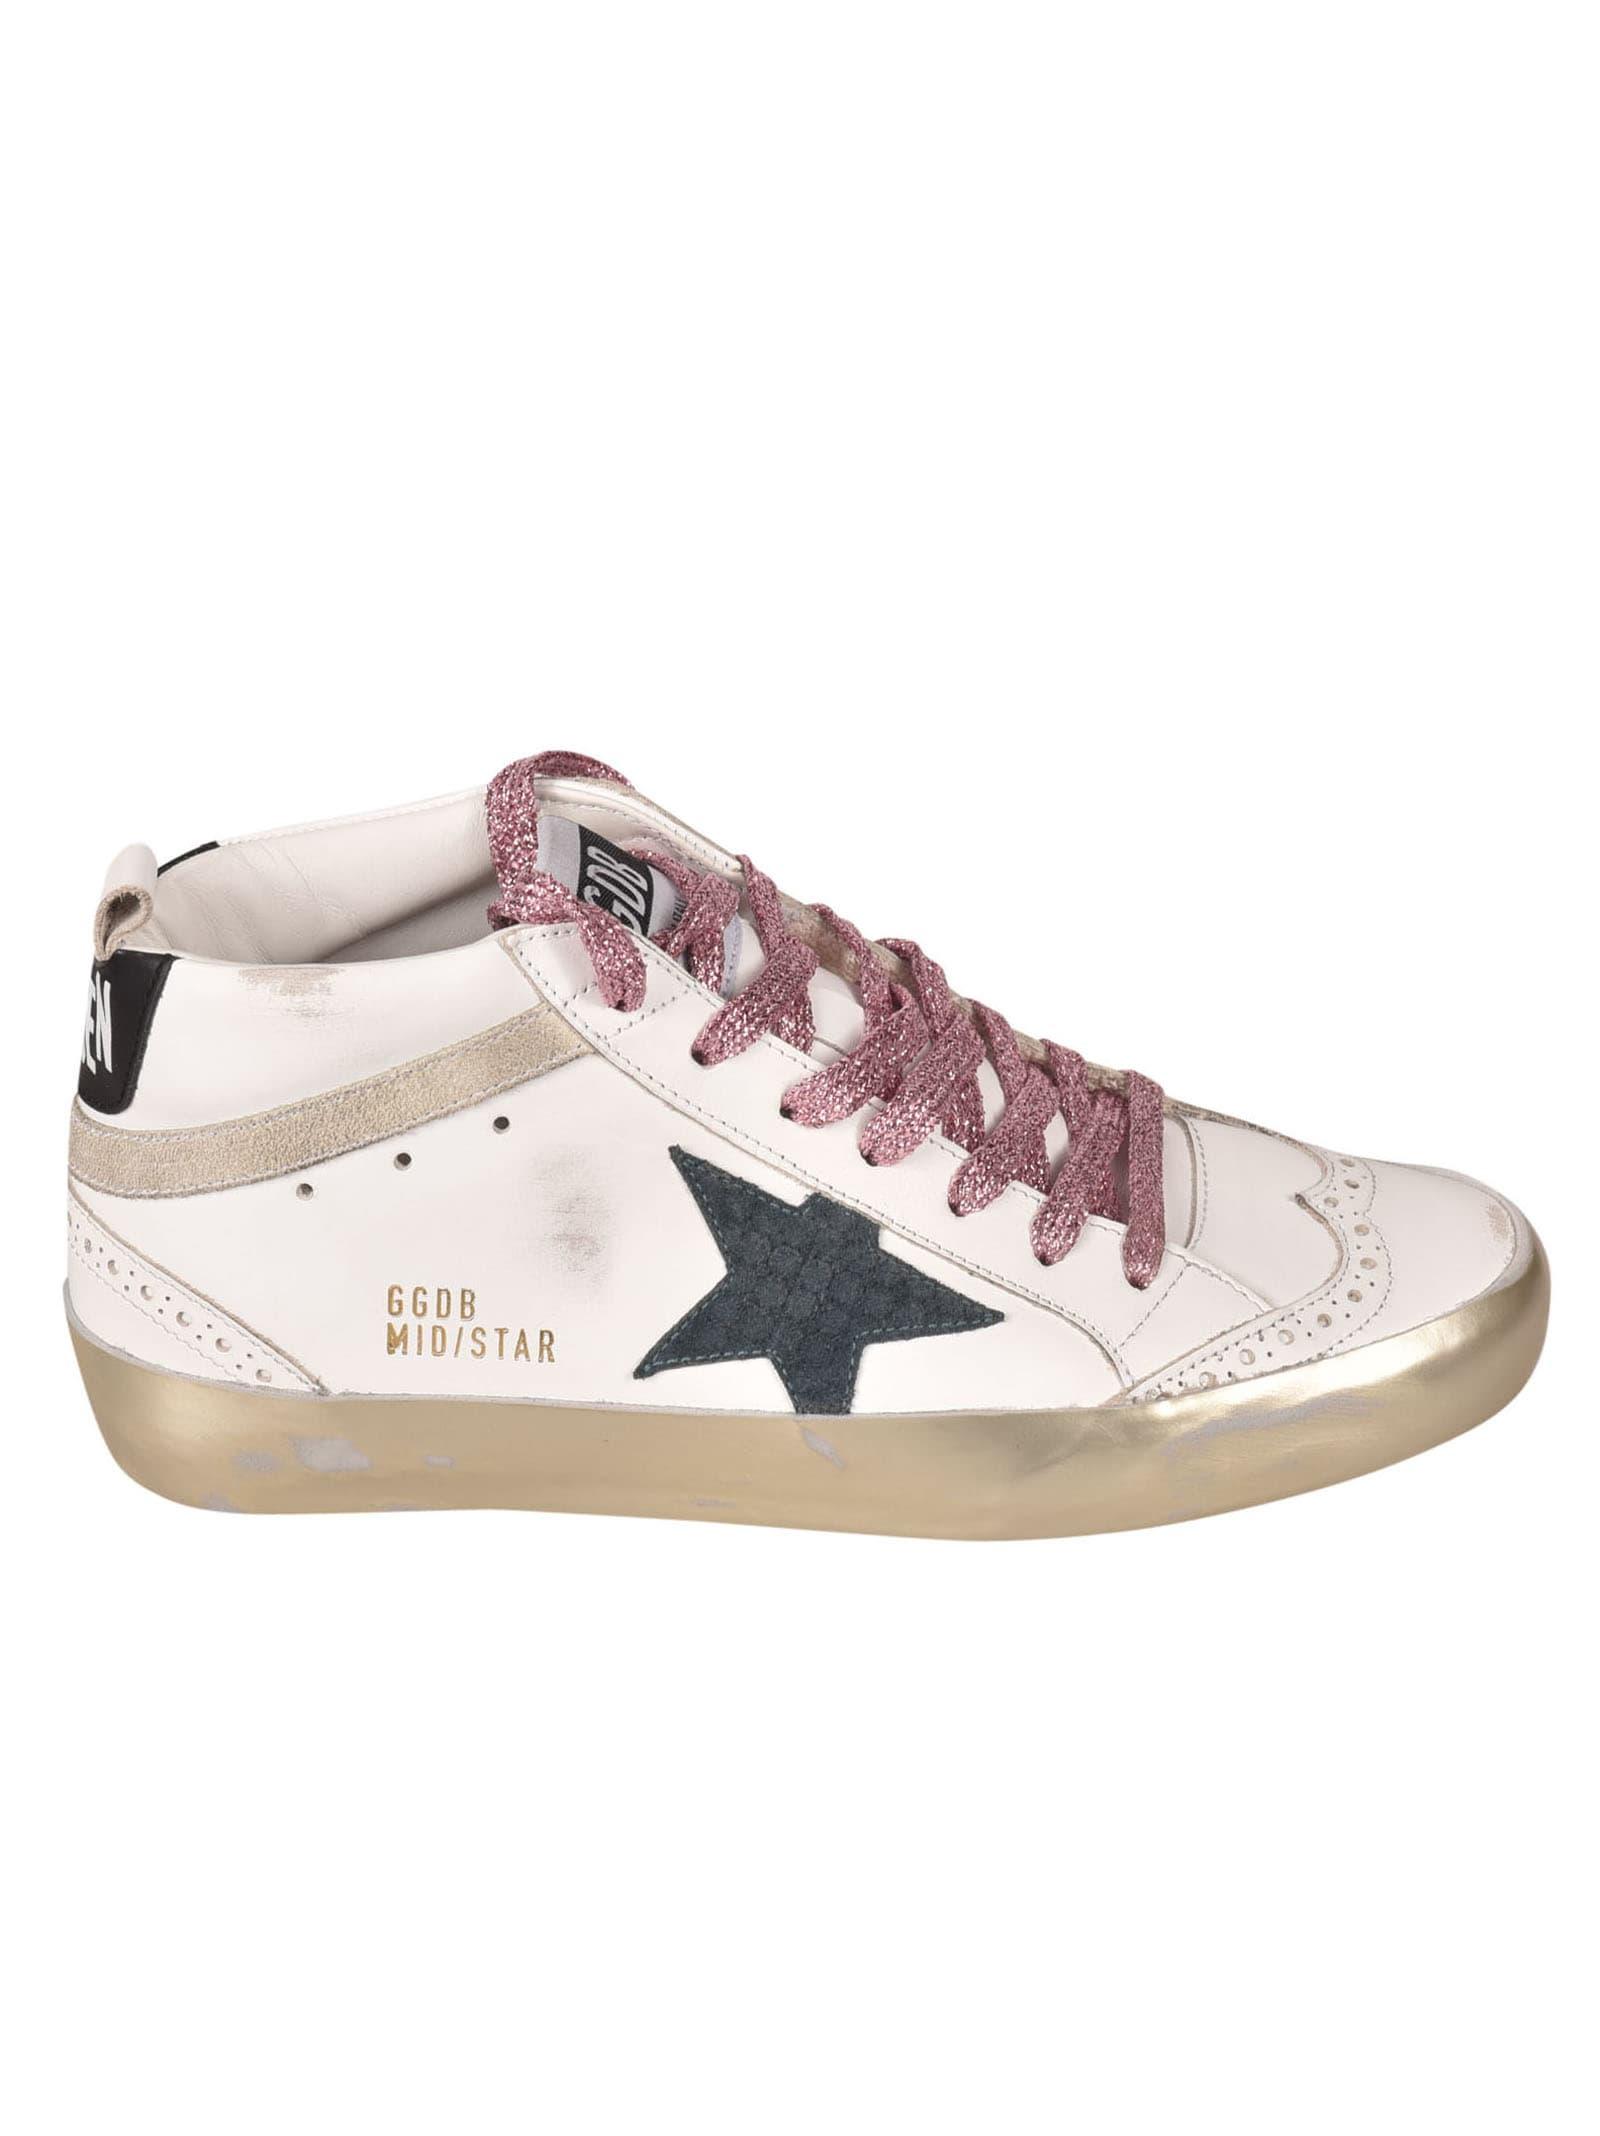 Golden Goose Mid Star Classic Sneakers